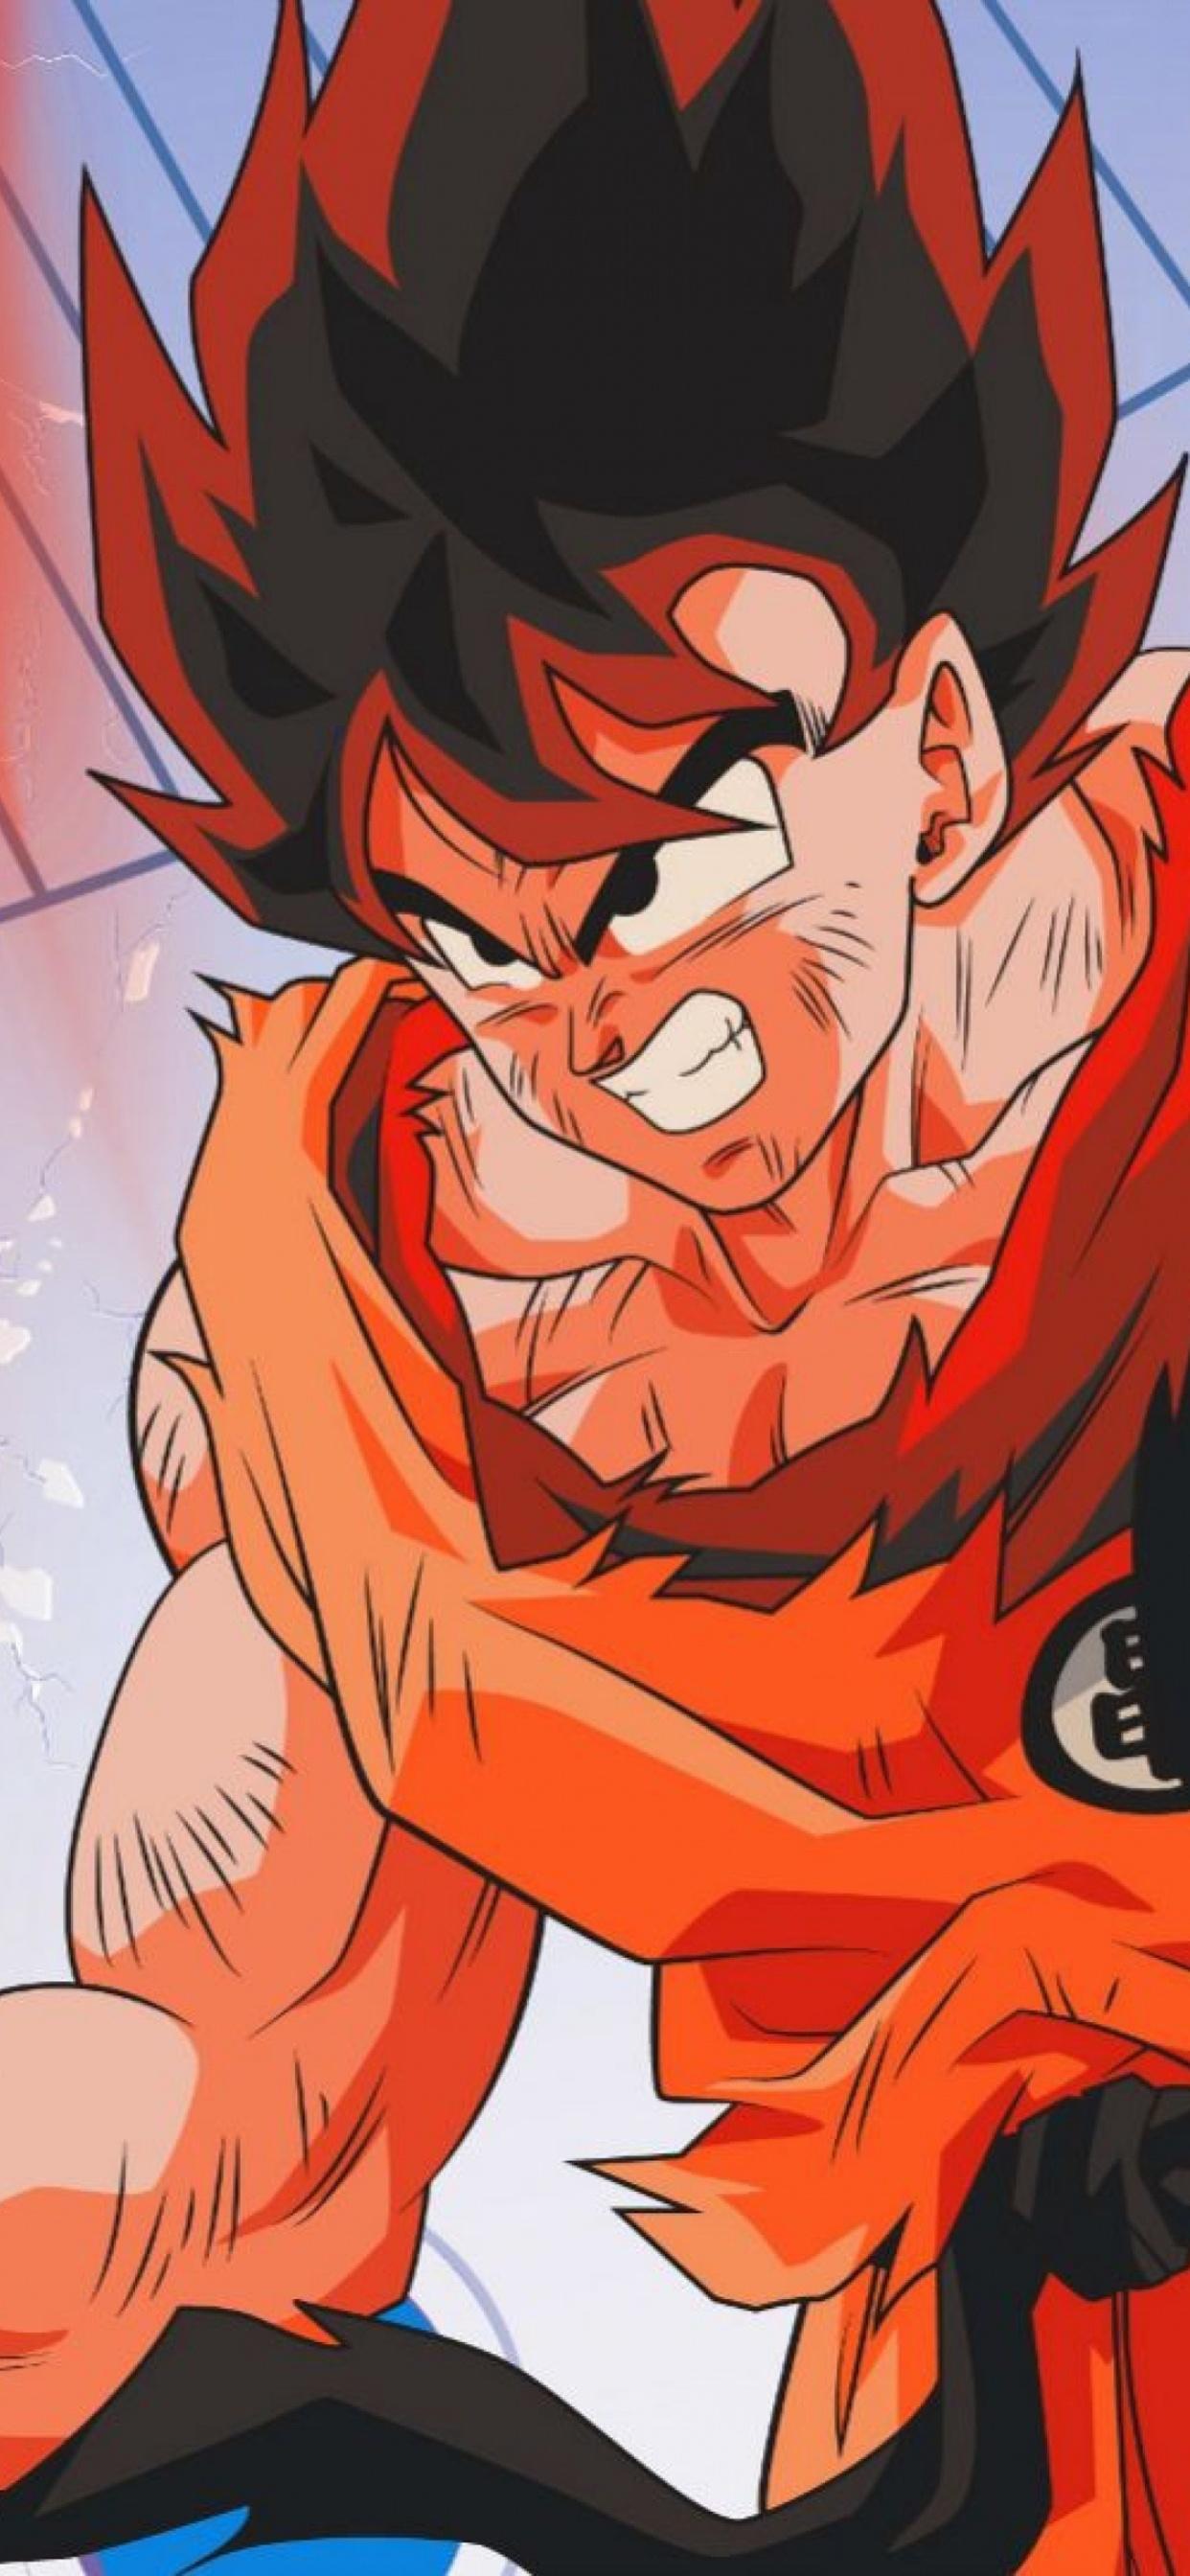 1242x2688 Goku Dragon Ball Z 4k Iphone Xs Max Hd 4k Wallpapers